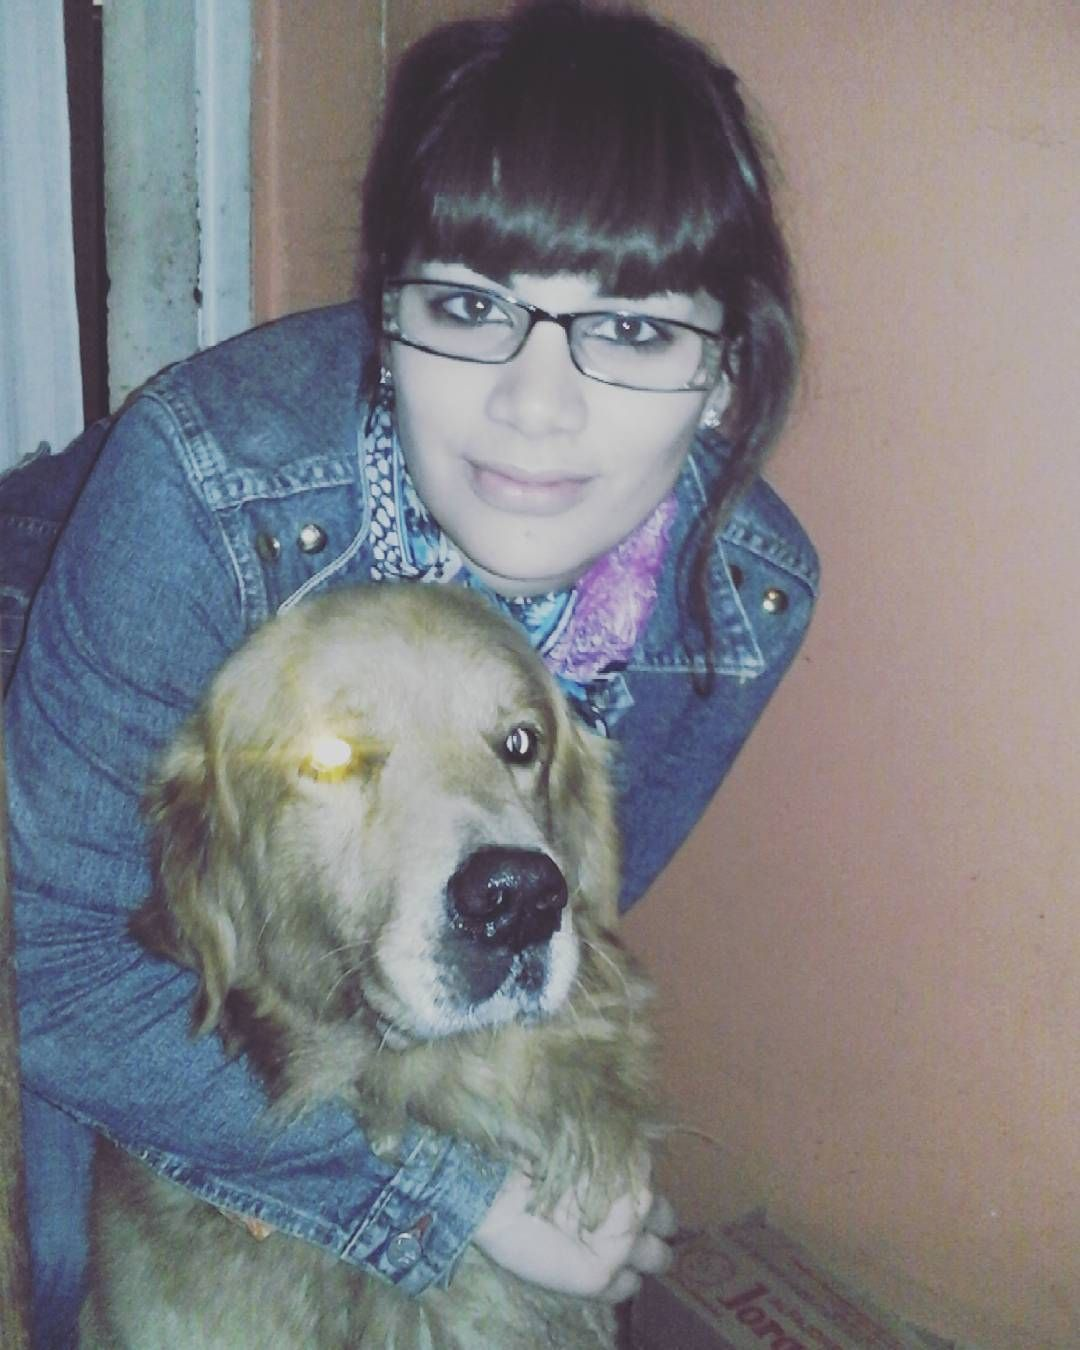 Corte que Neron salio re terminator :p #terminator#dog#amor#canino by melu_fortin